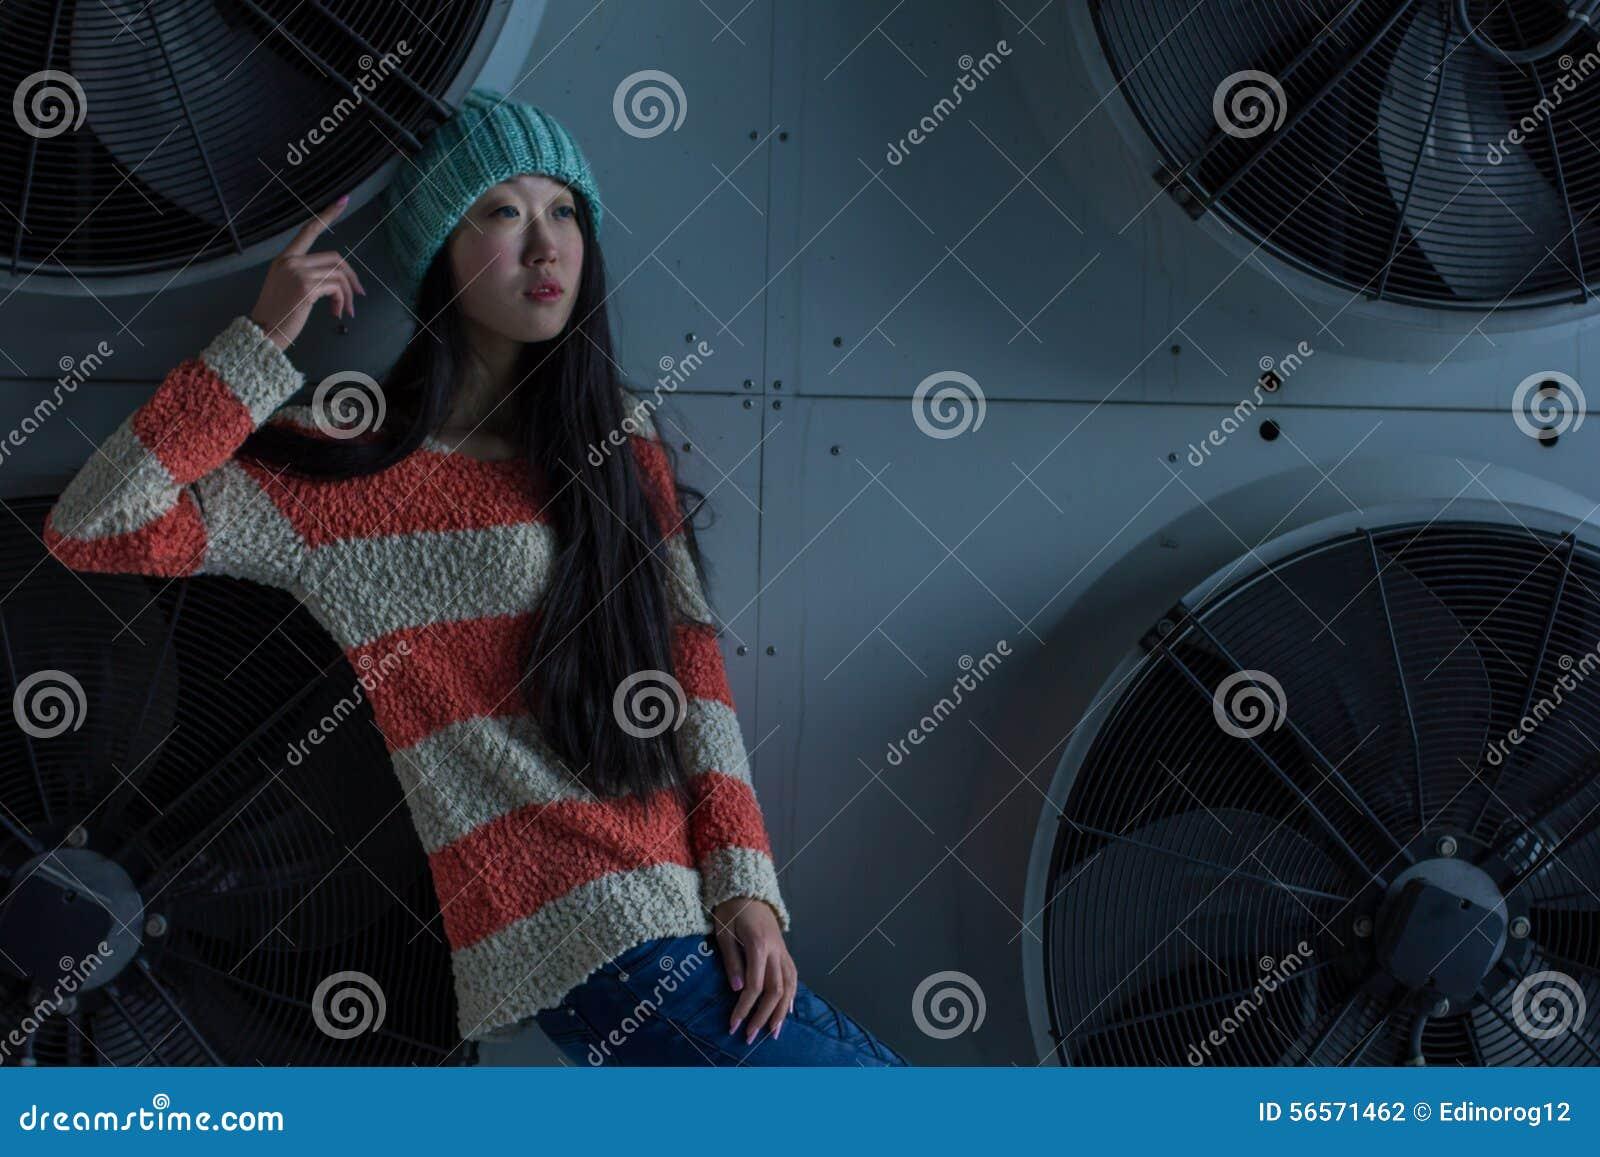 Download Πορτρέτο του μοντέρνου ασιατικού κοριτσιού στην οδό Στοκ Εικόνες - εικόνα από έκφραση, σύγχρονος: 56571462